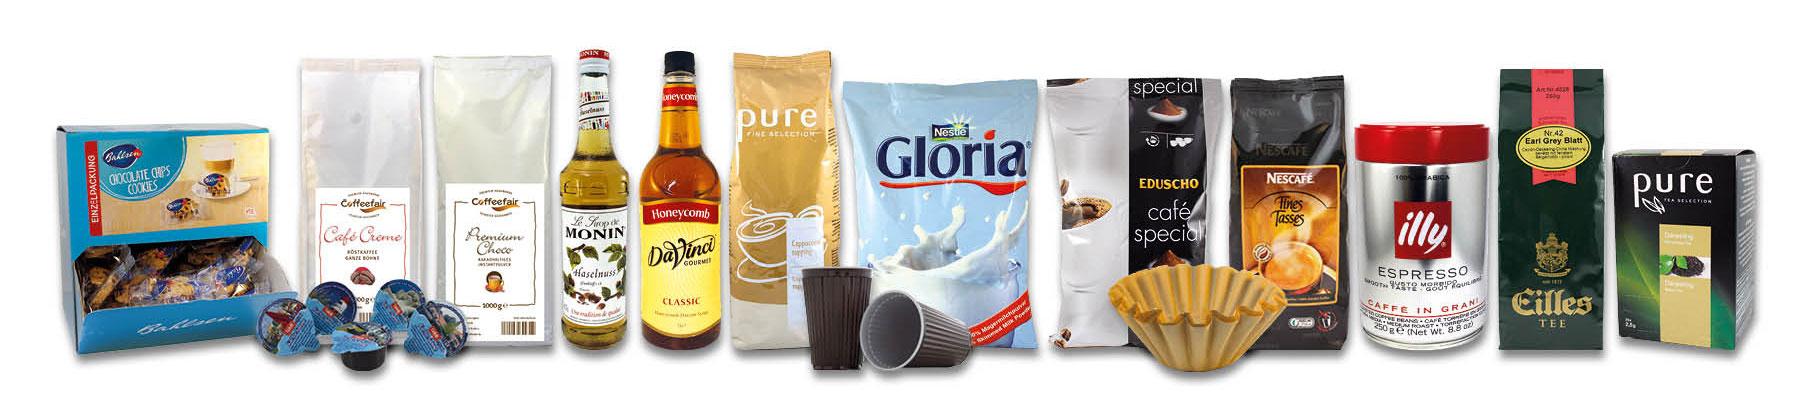 Coffeefair Produkte